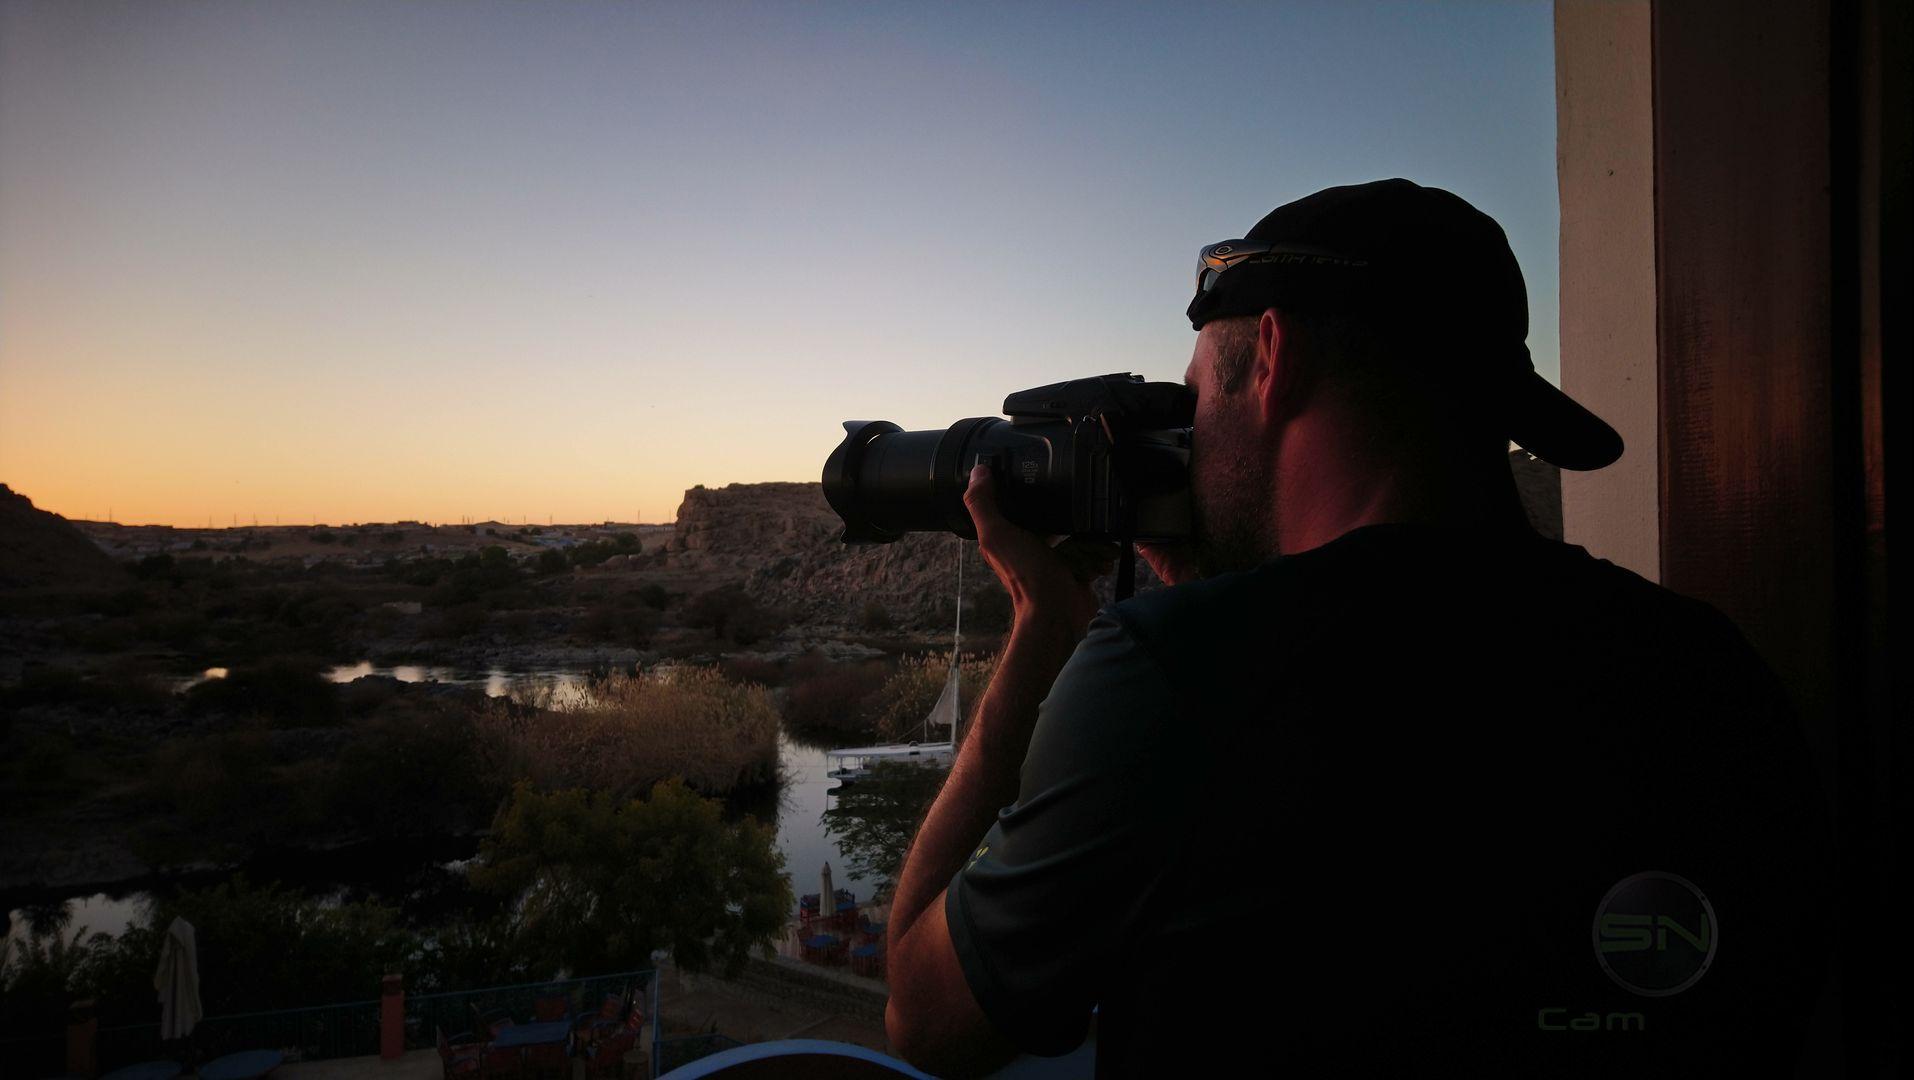 Alles-im-Blick-Nikon-Coolpix-P1000-SmartCamNews